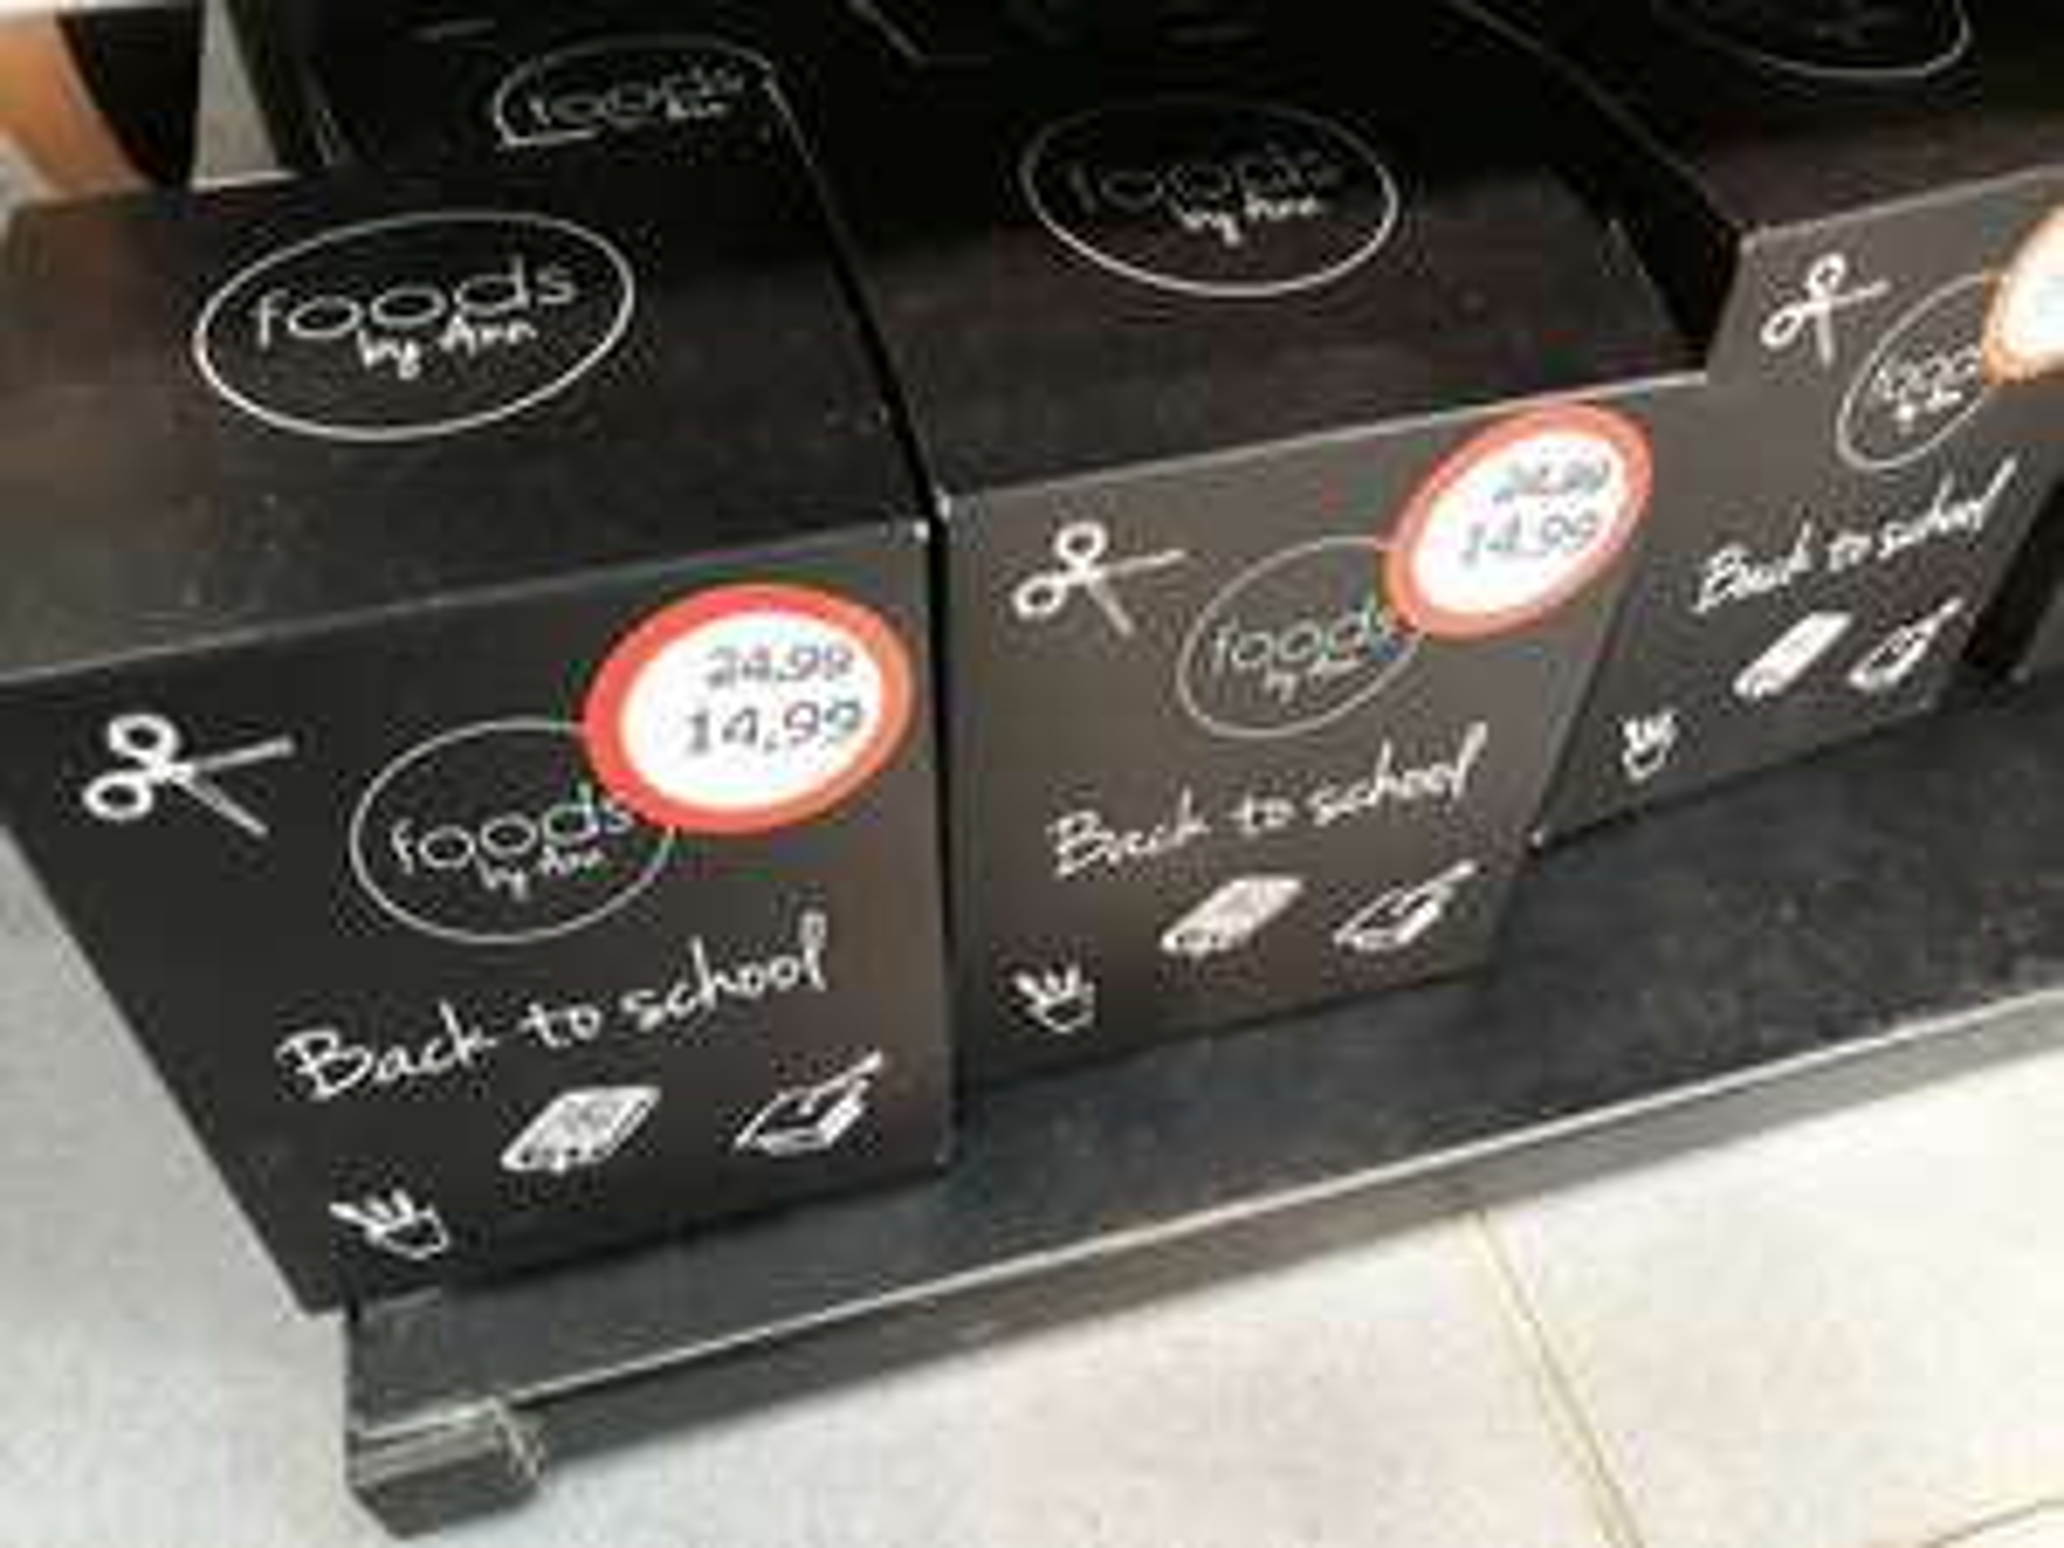 Foods by Ann back to school - Empik